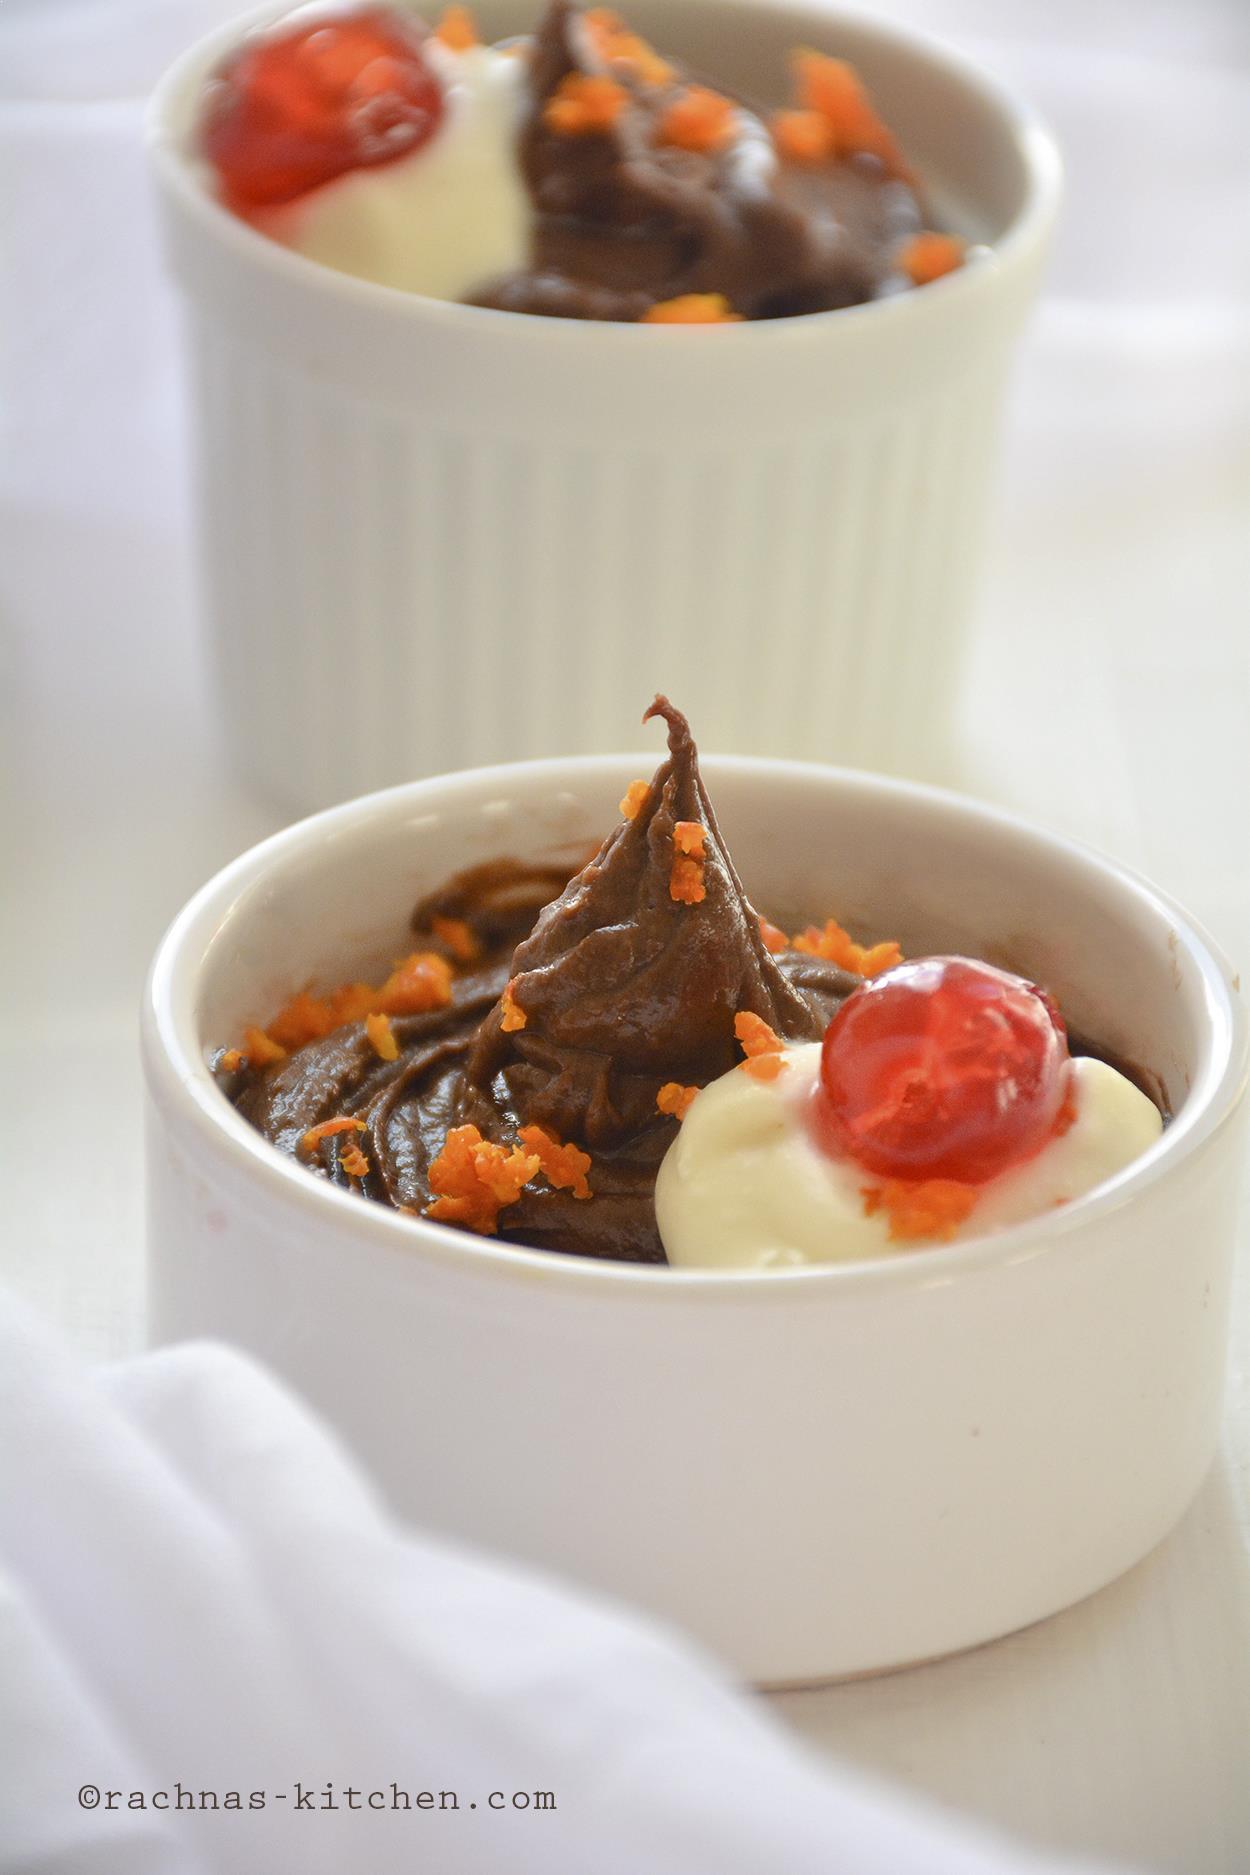 Chococlate orange mousse